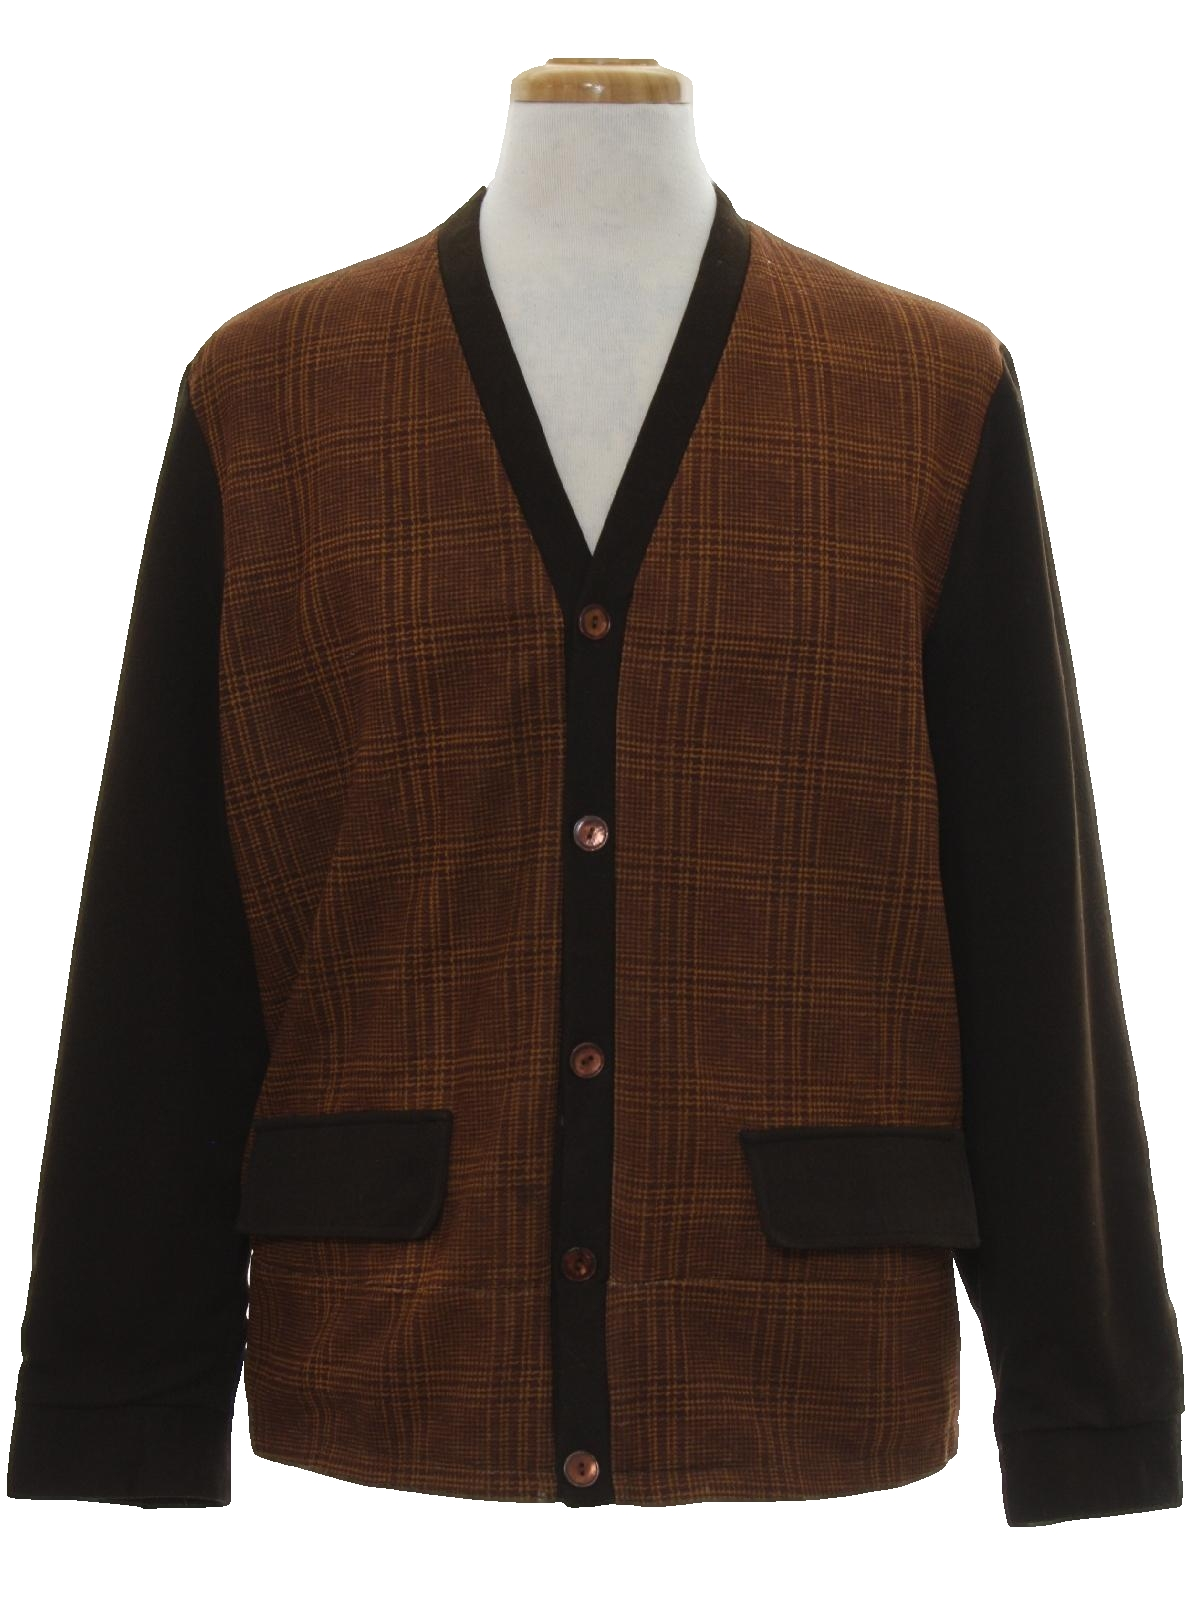 60s Retro Jacket: 60s -Unreadable Label- Mens shades of brown ...